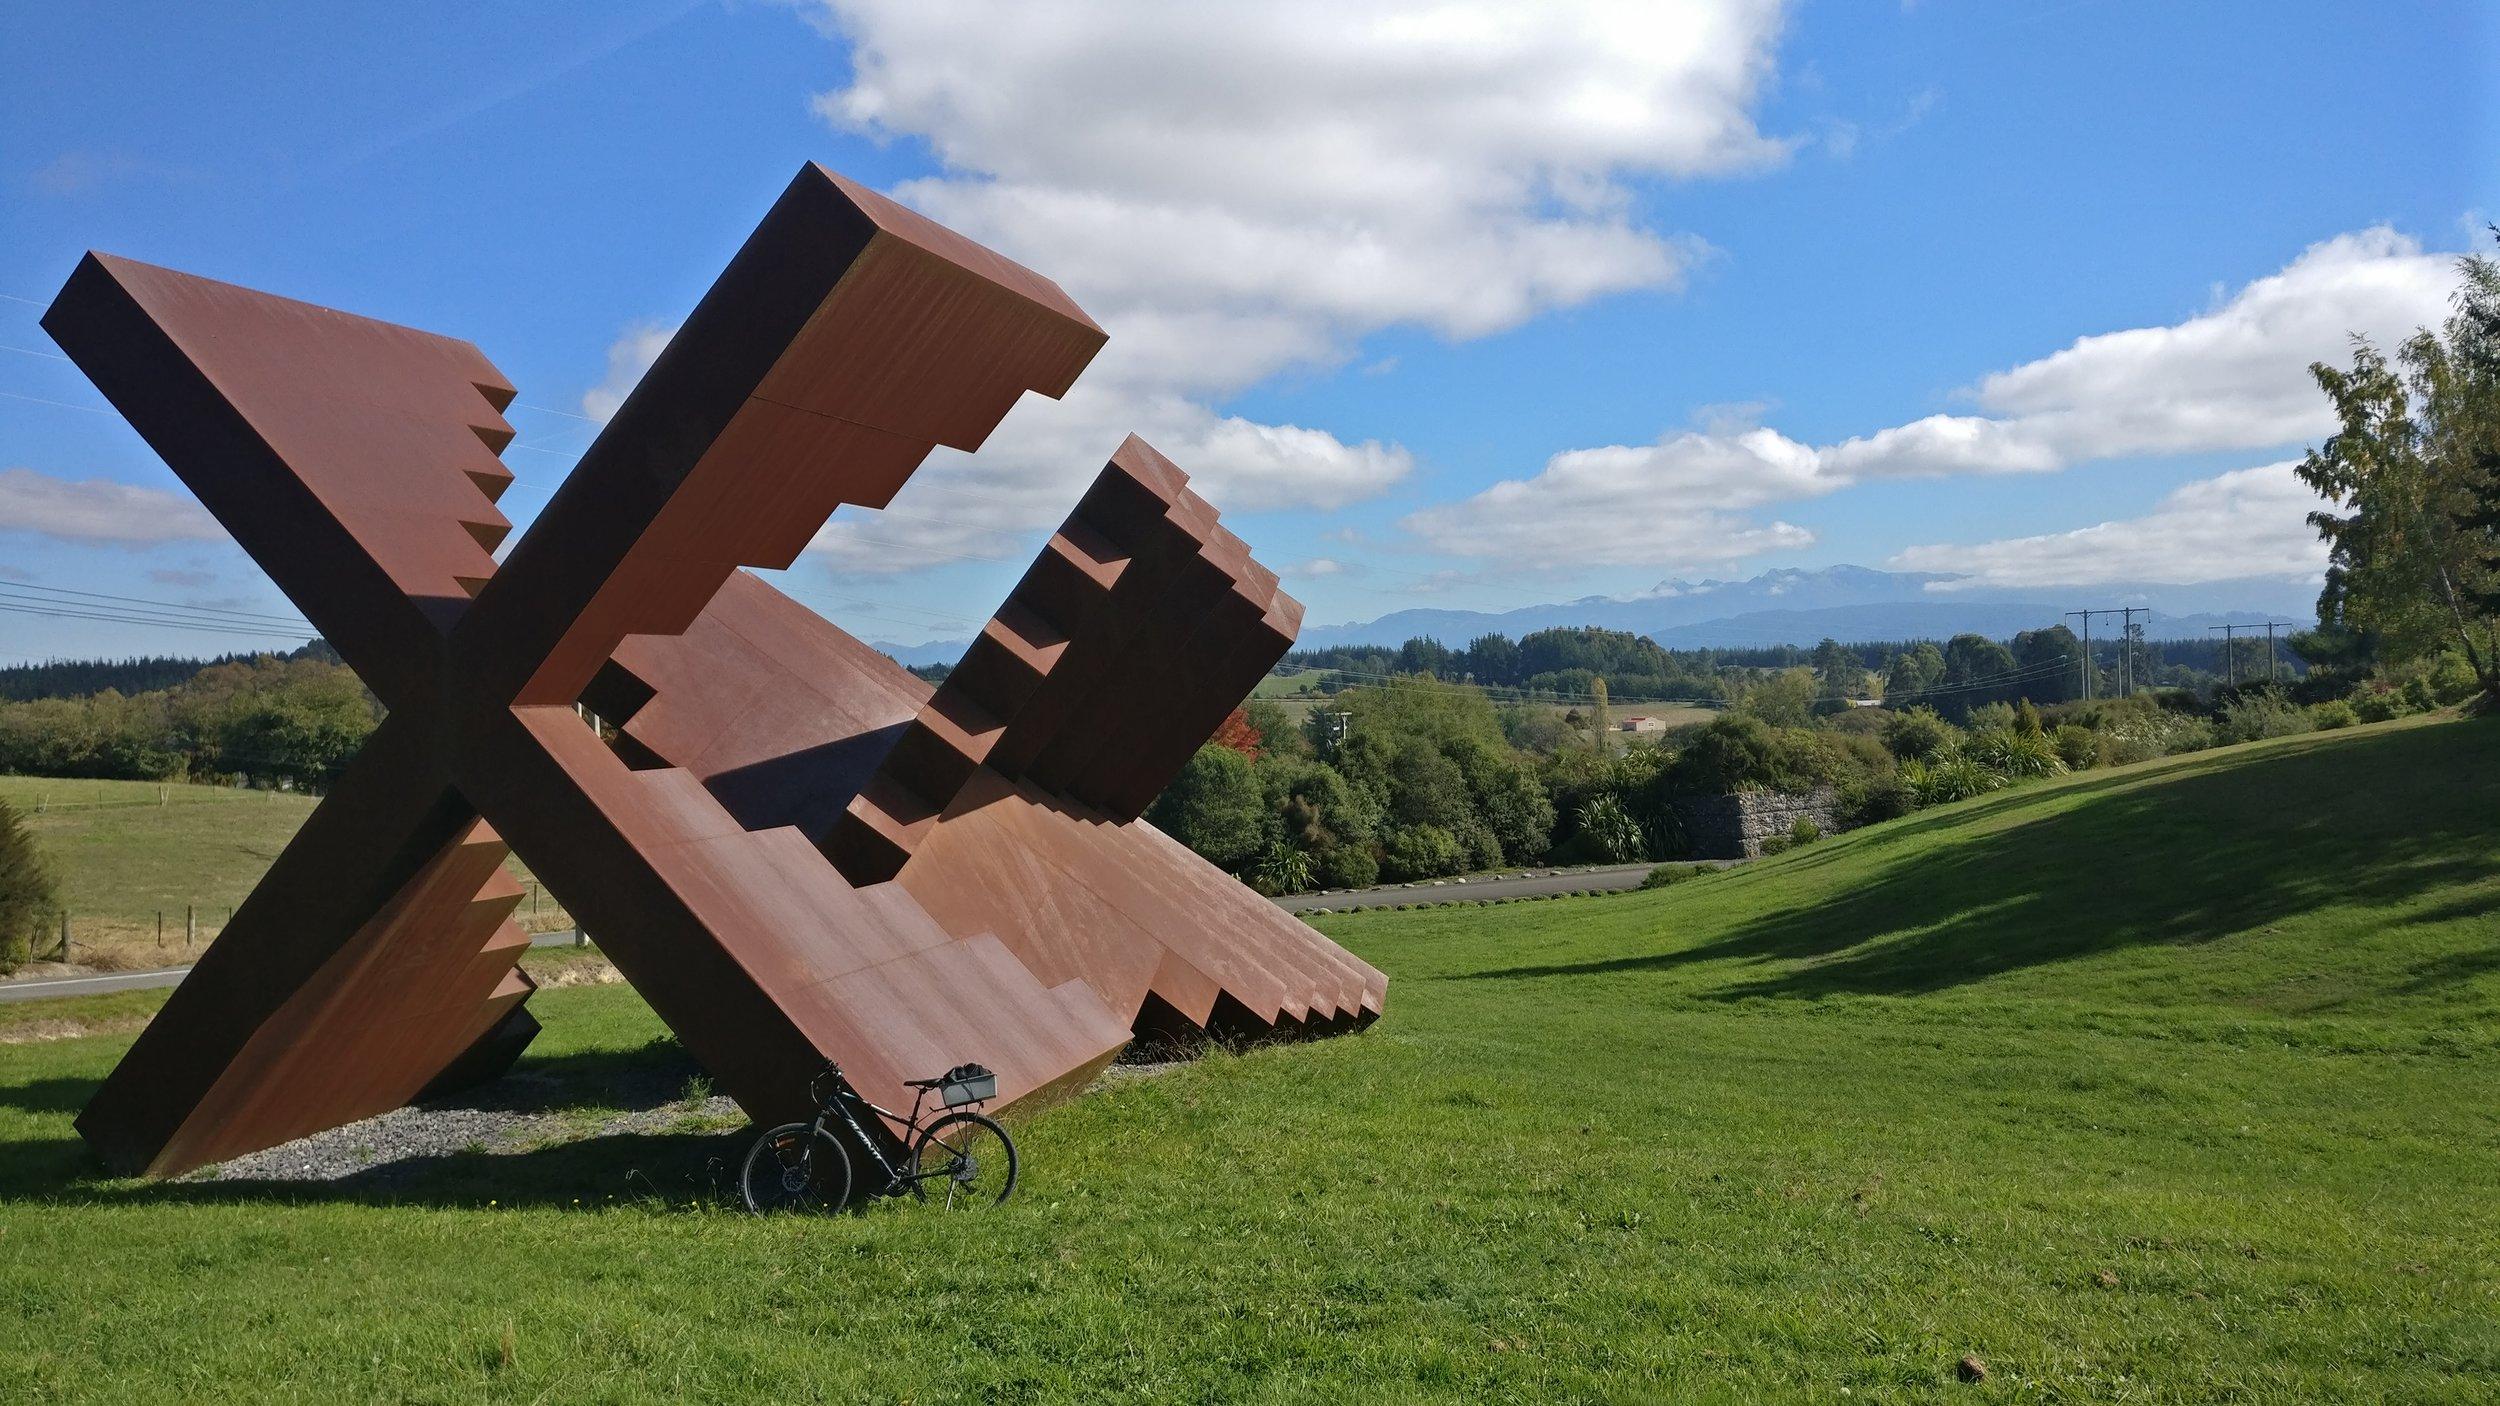 Marte Szirmay sculpture